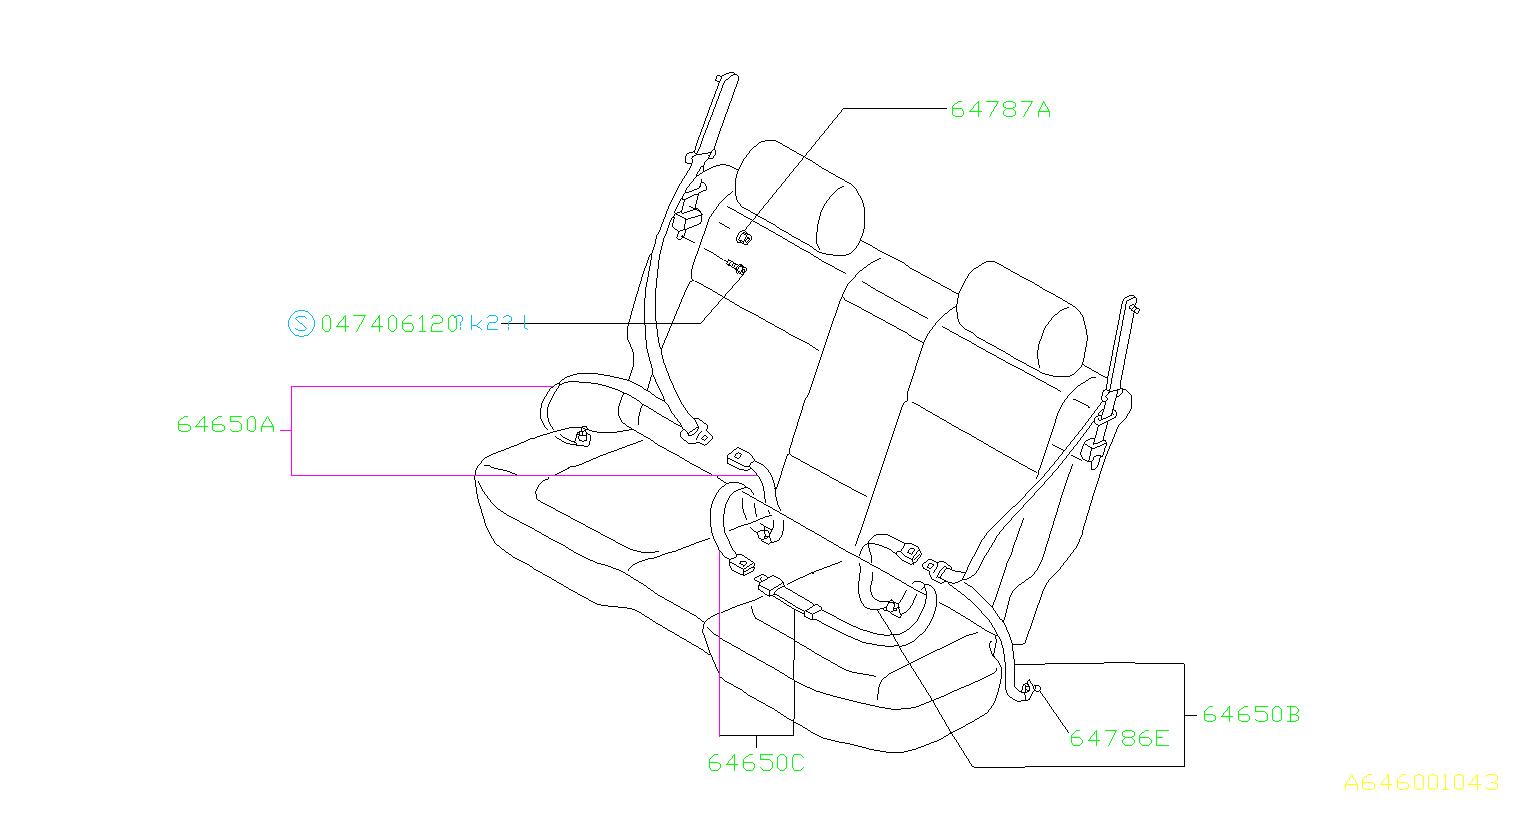 Subaru Forester Seat Belt Lap and Shoulder Belt (Right